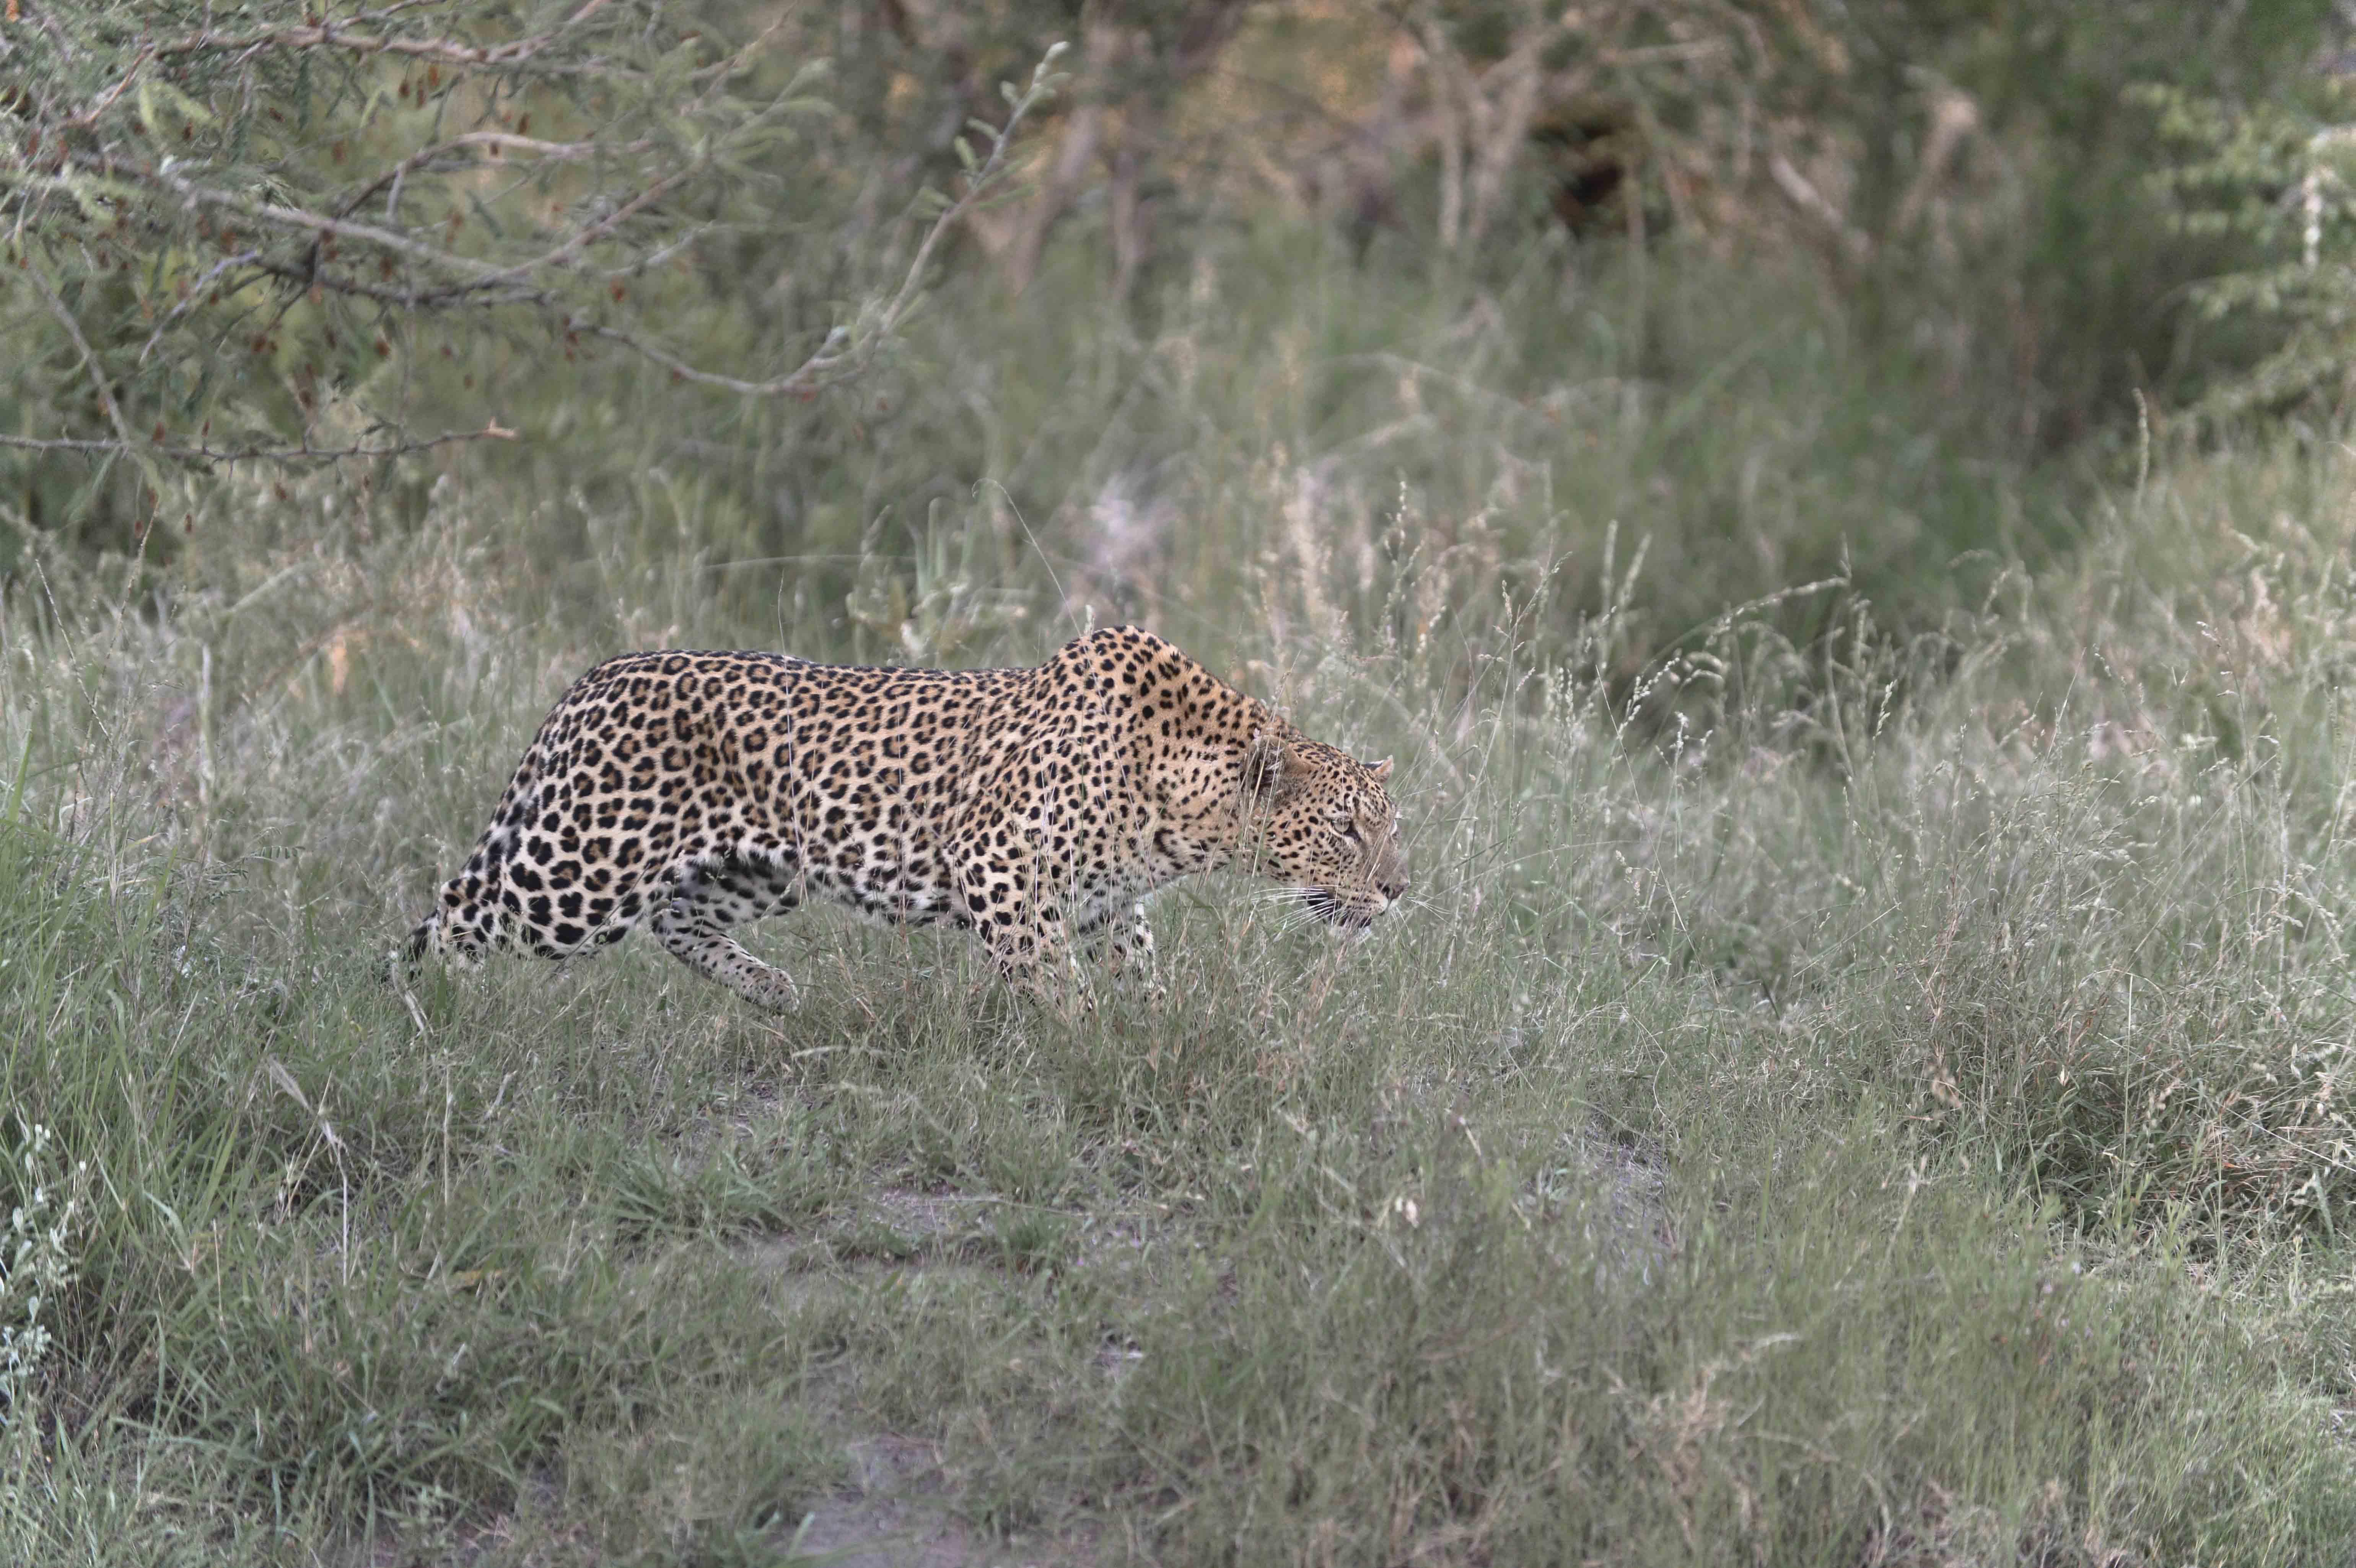 Leopard (Panthera pardus), hunting; ZA ©Johannes Ratermann